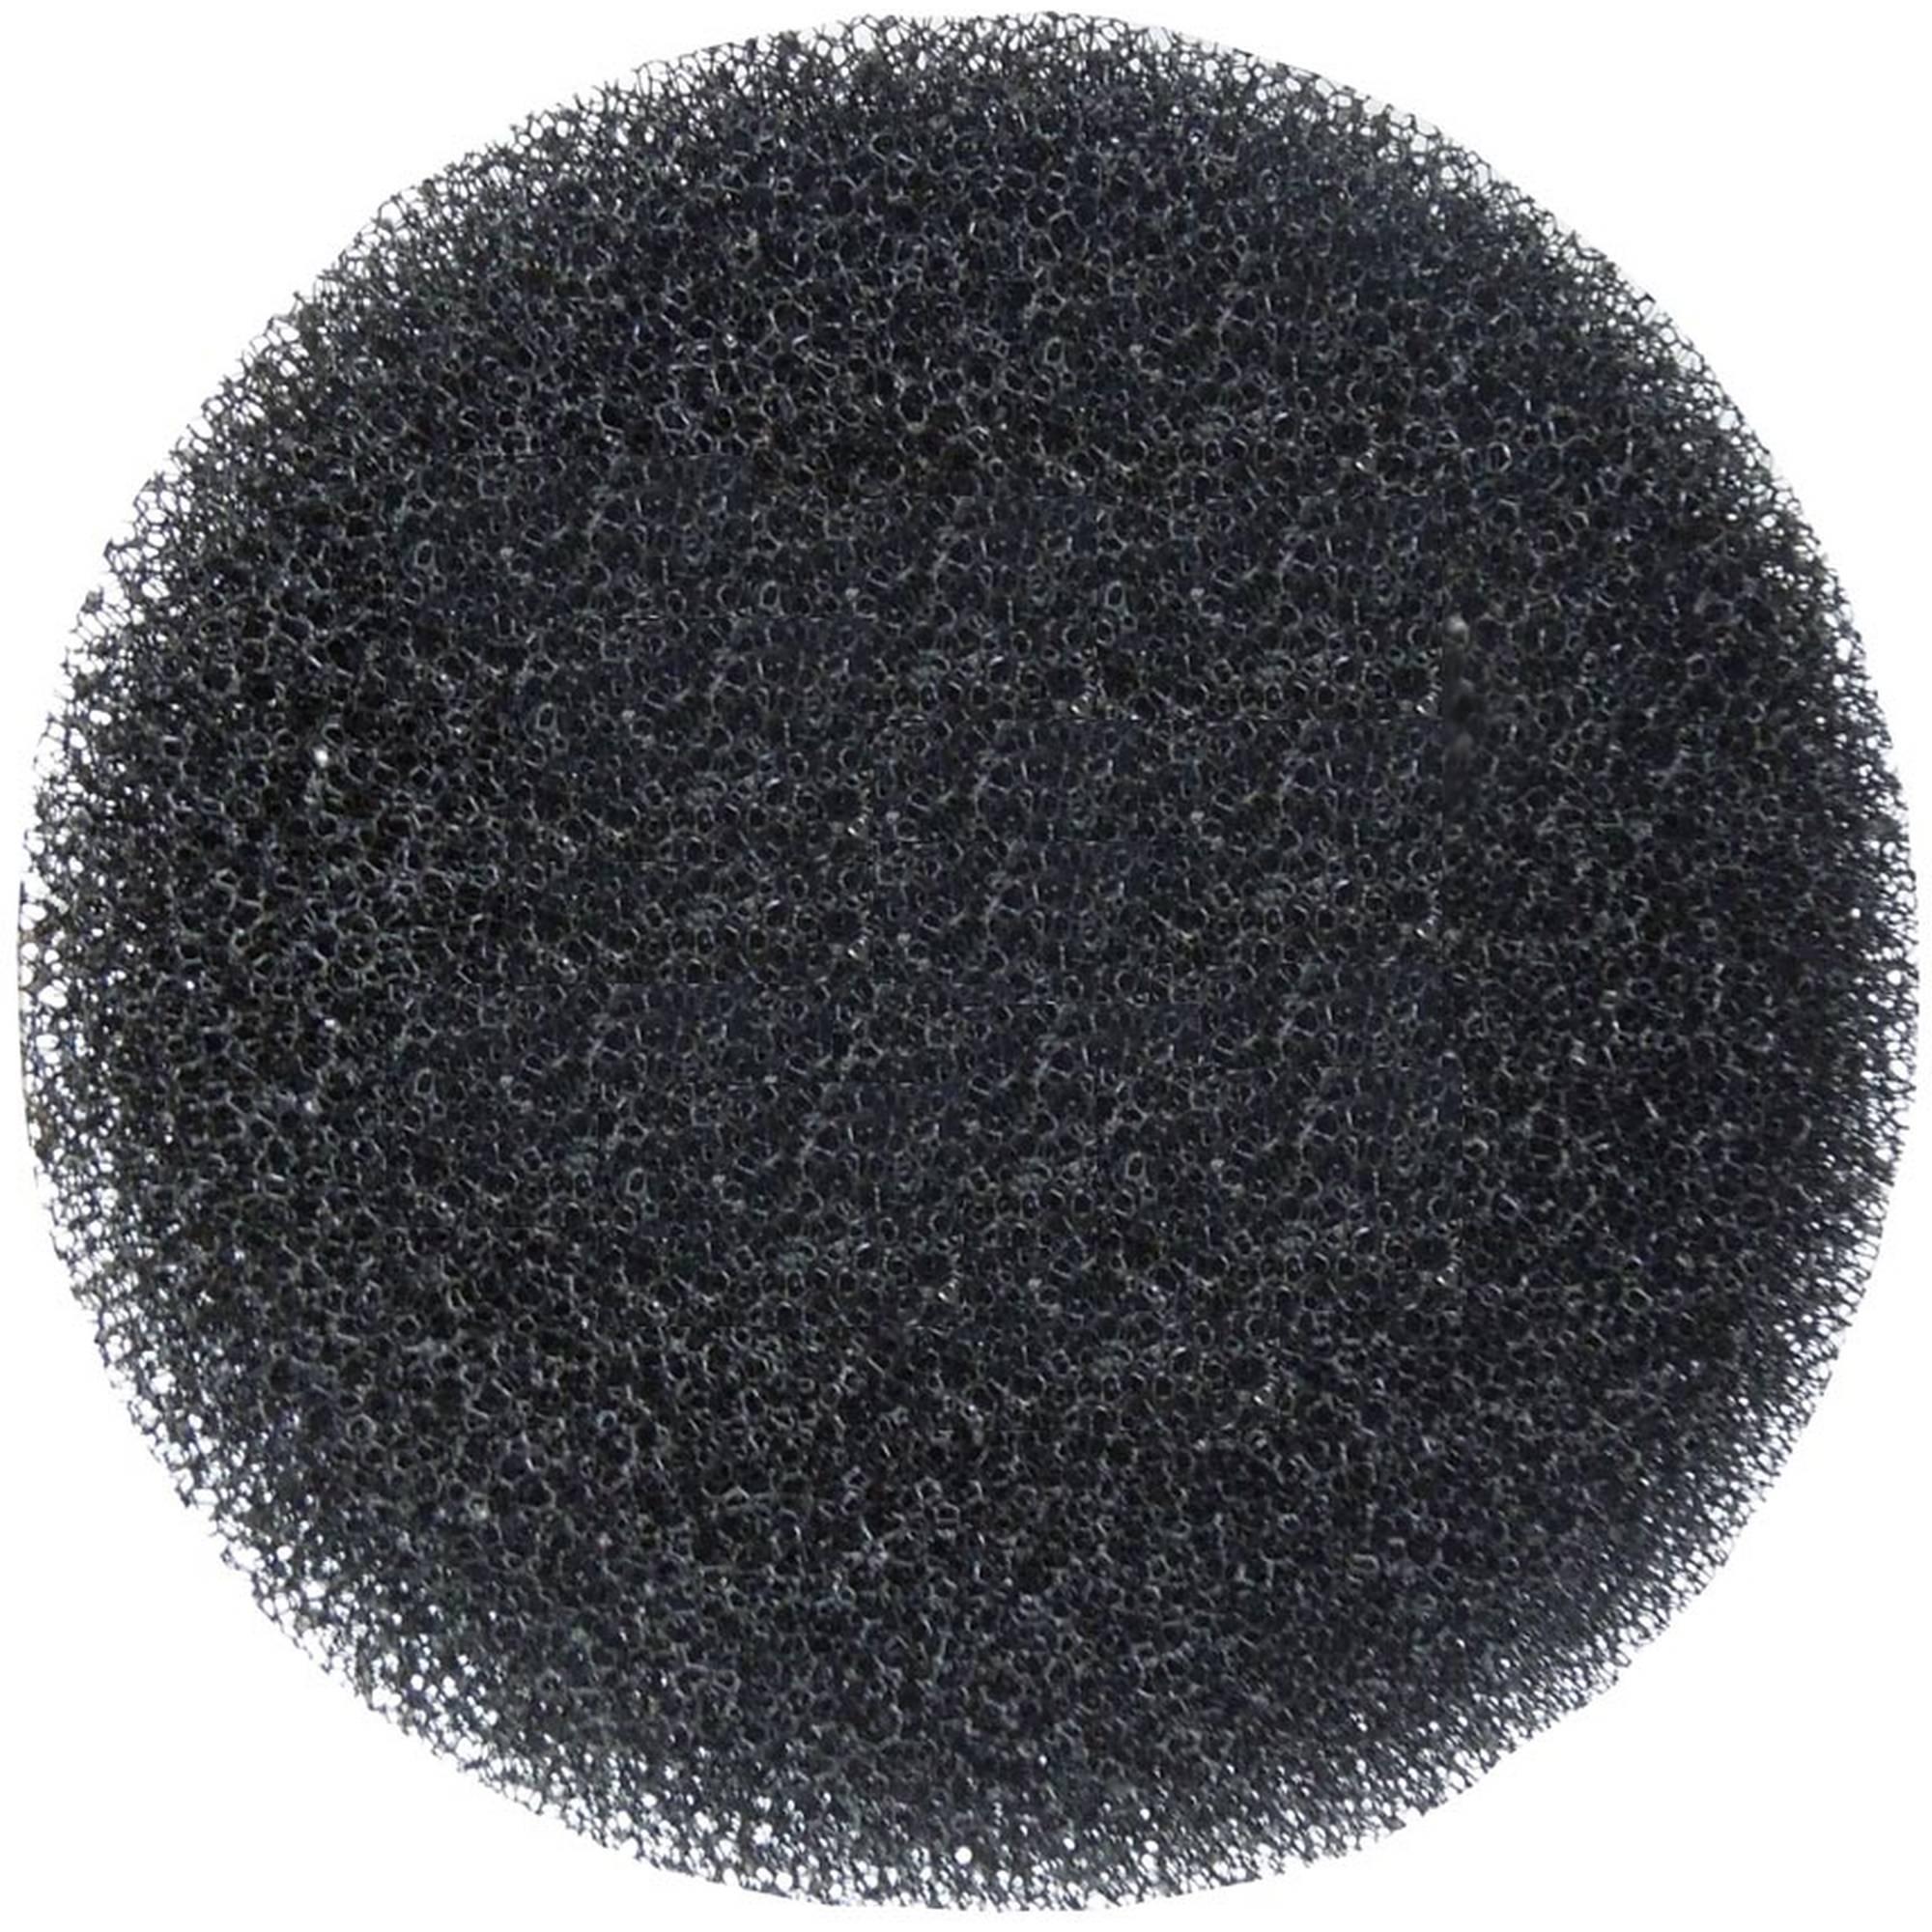 Filterschwamm, schwarz, grob HLF4000-00